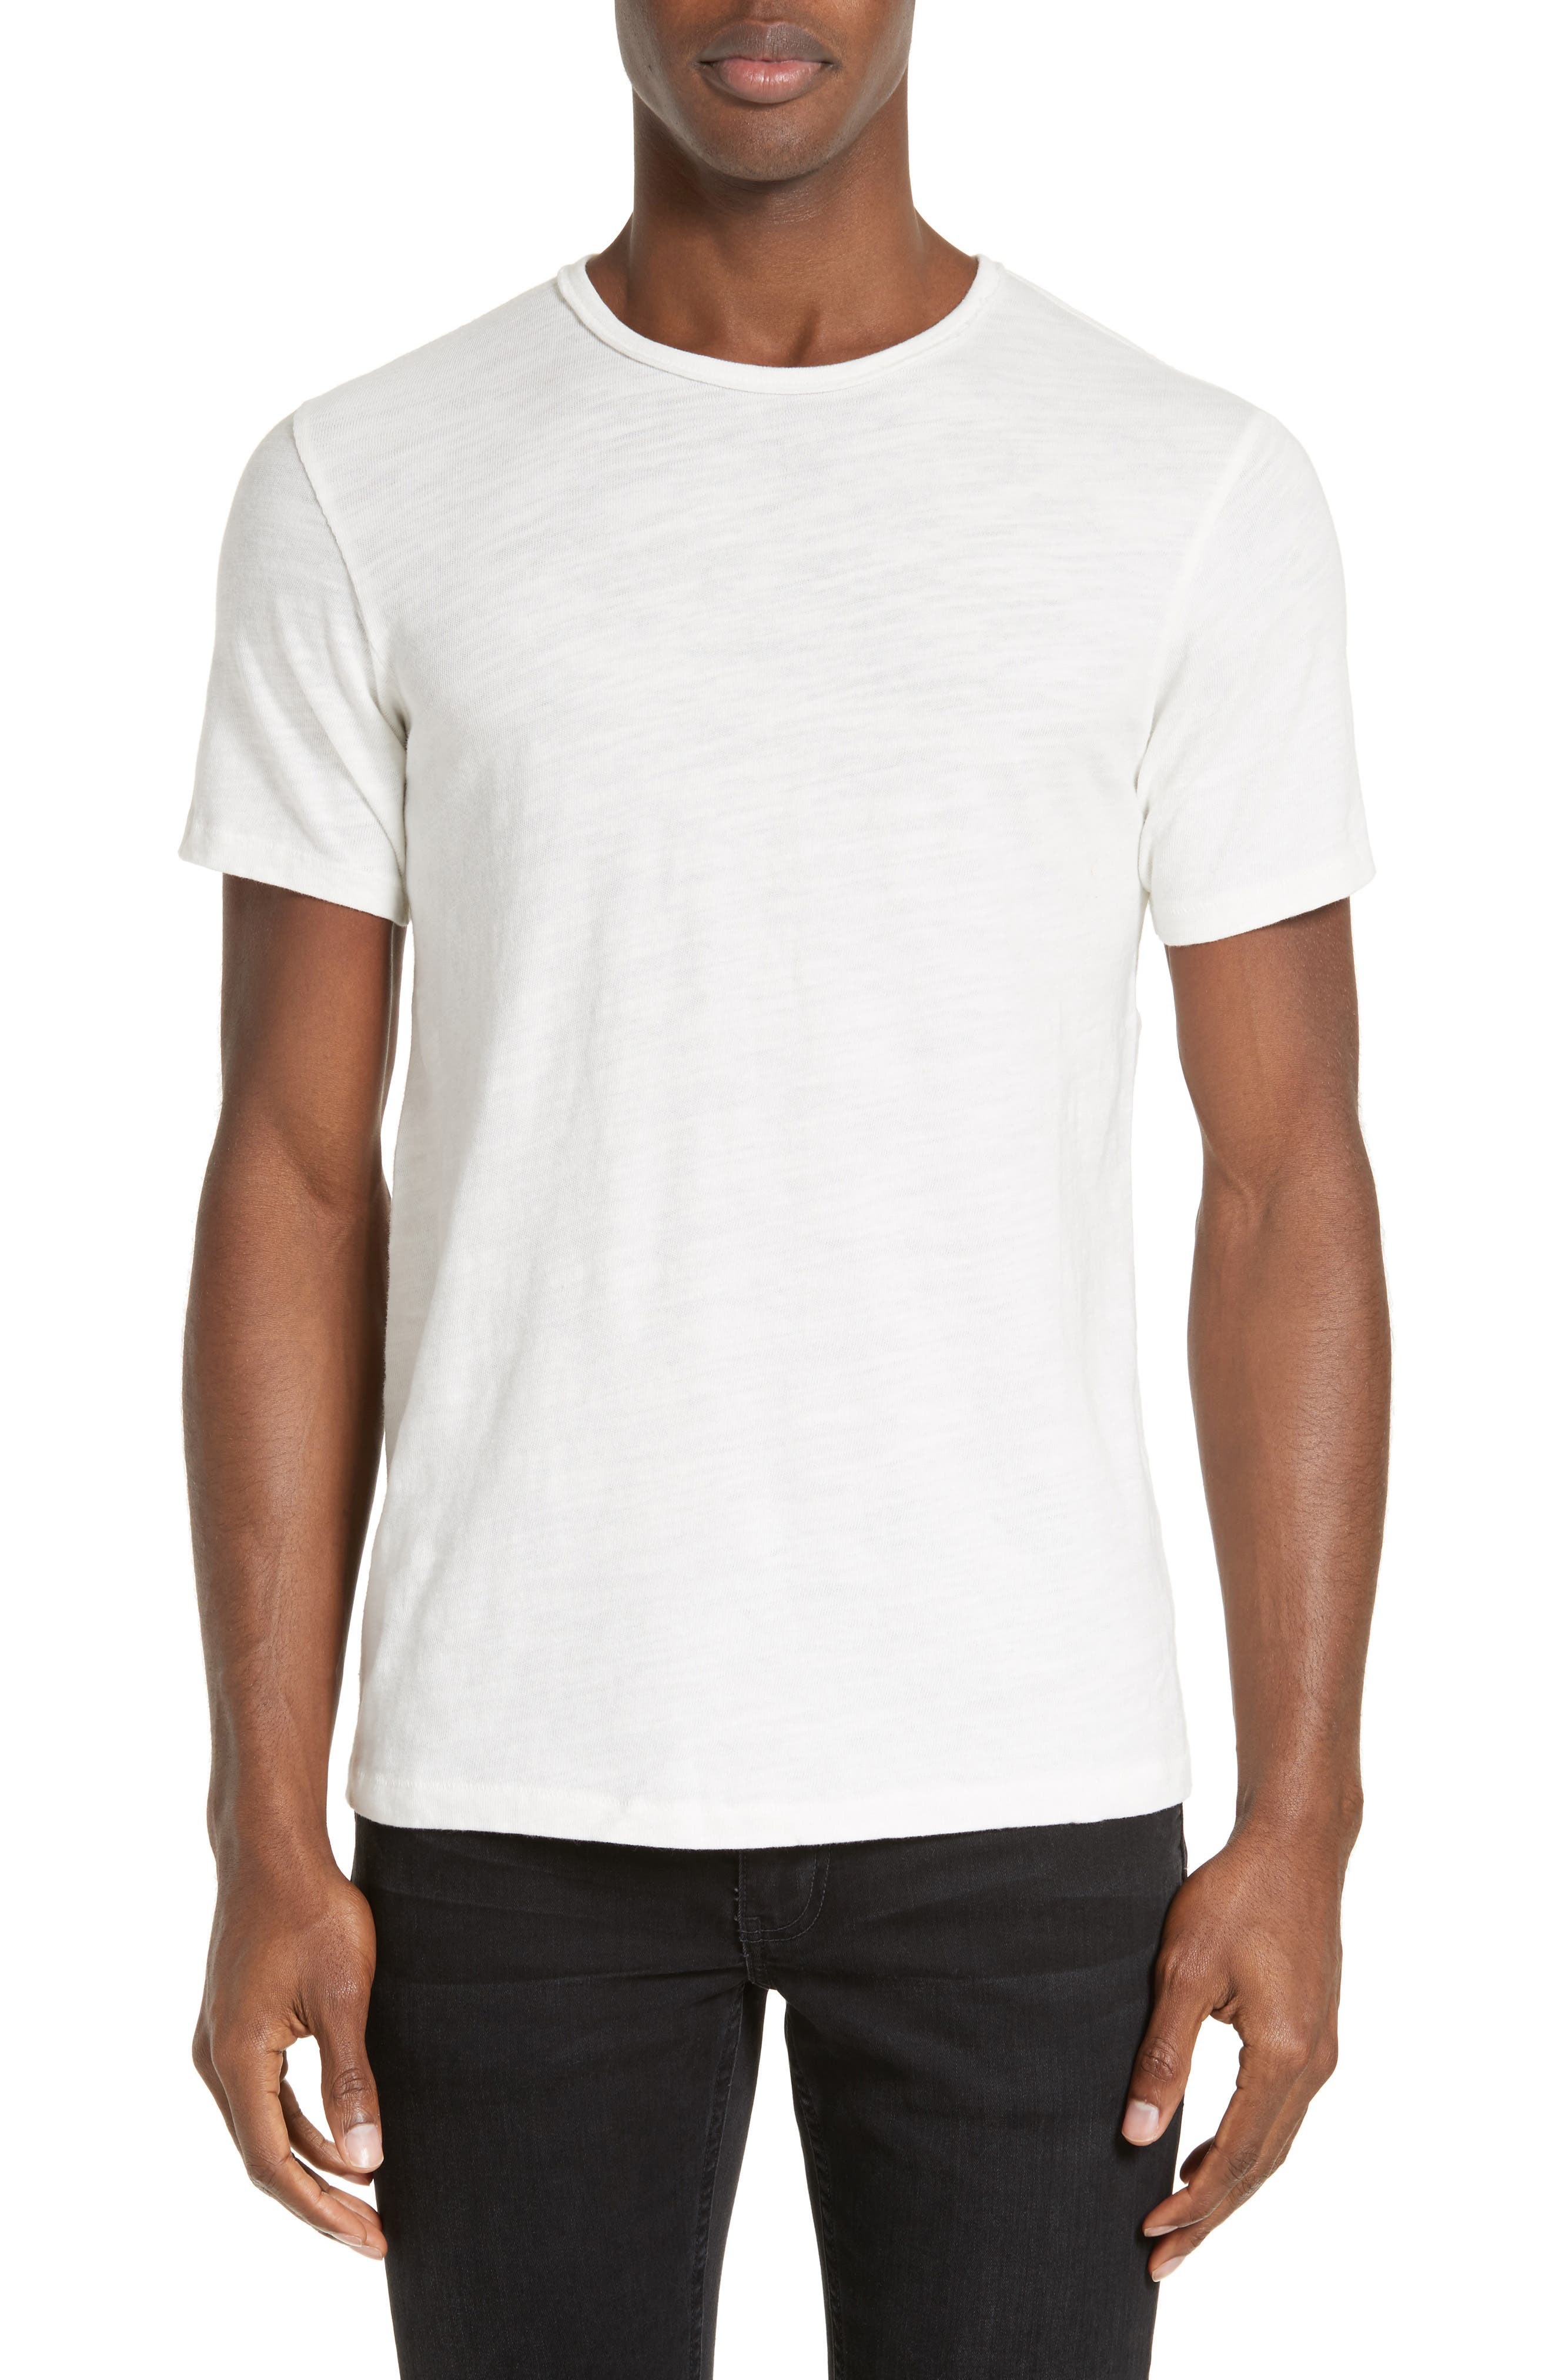 Main Image - rag & bone Standard Issue Slubbed Cotton T-Shirt